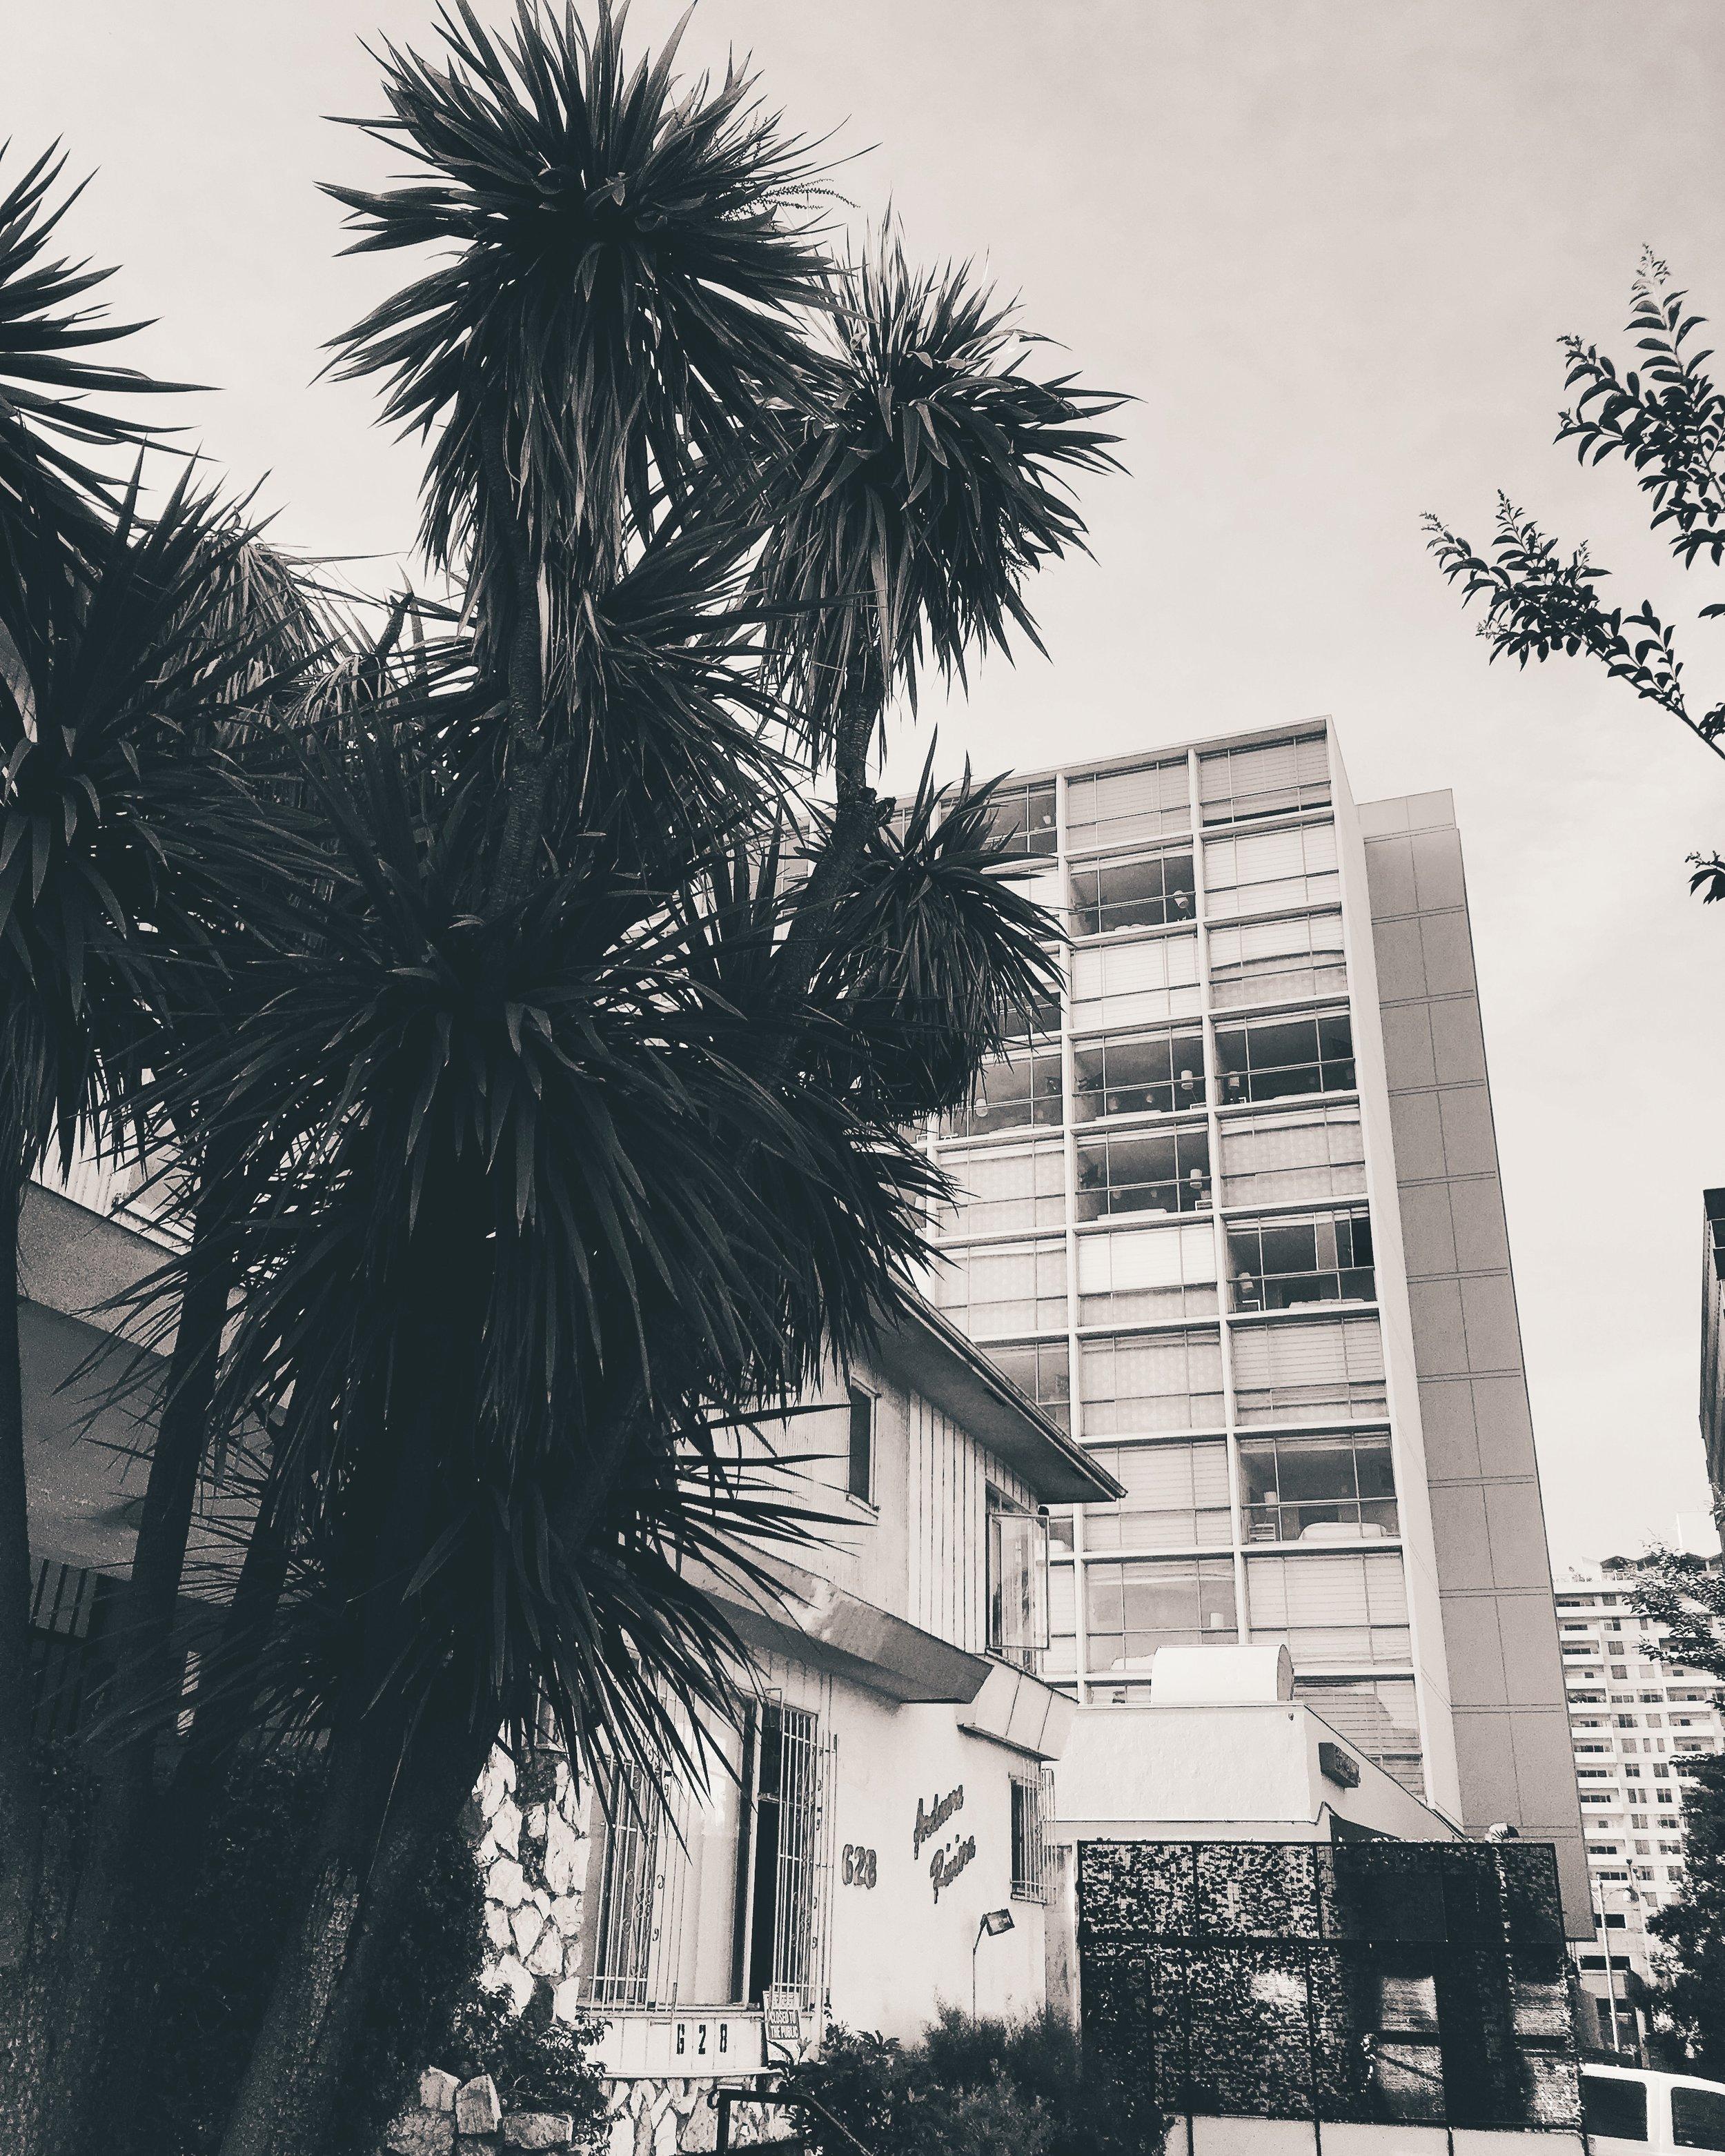 Los Angeles by Liz Gardner